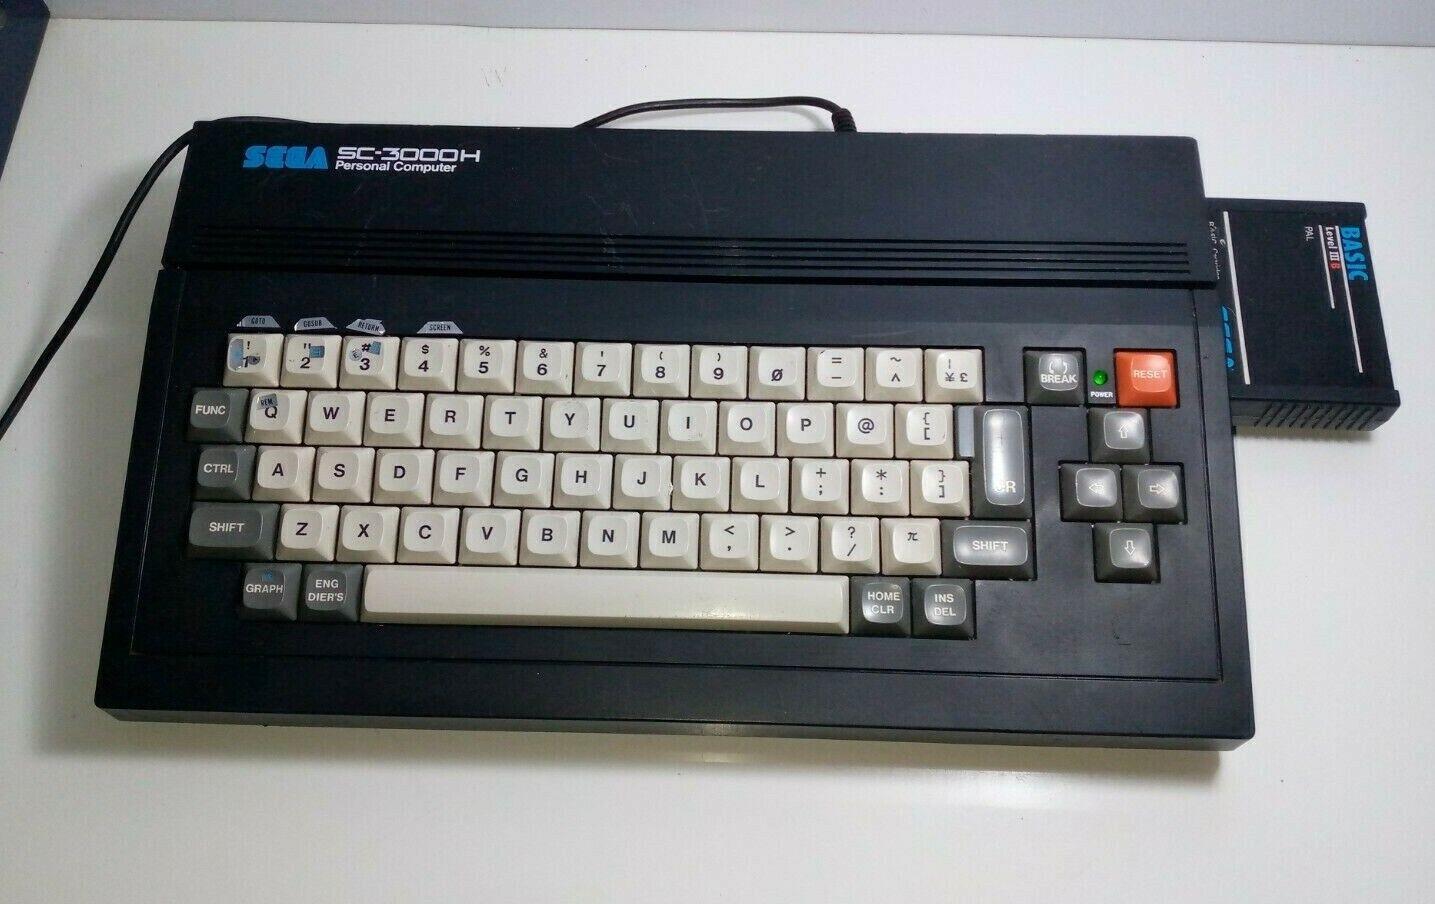  RARE SEGA SC-3000 H Vinatge Computer Gaming Conso…